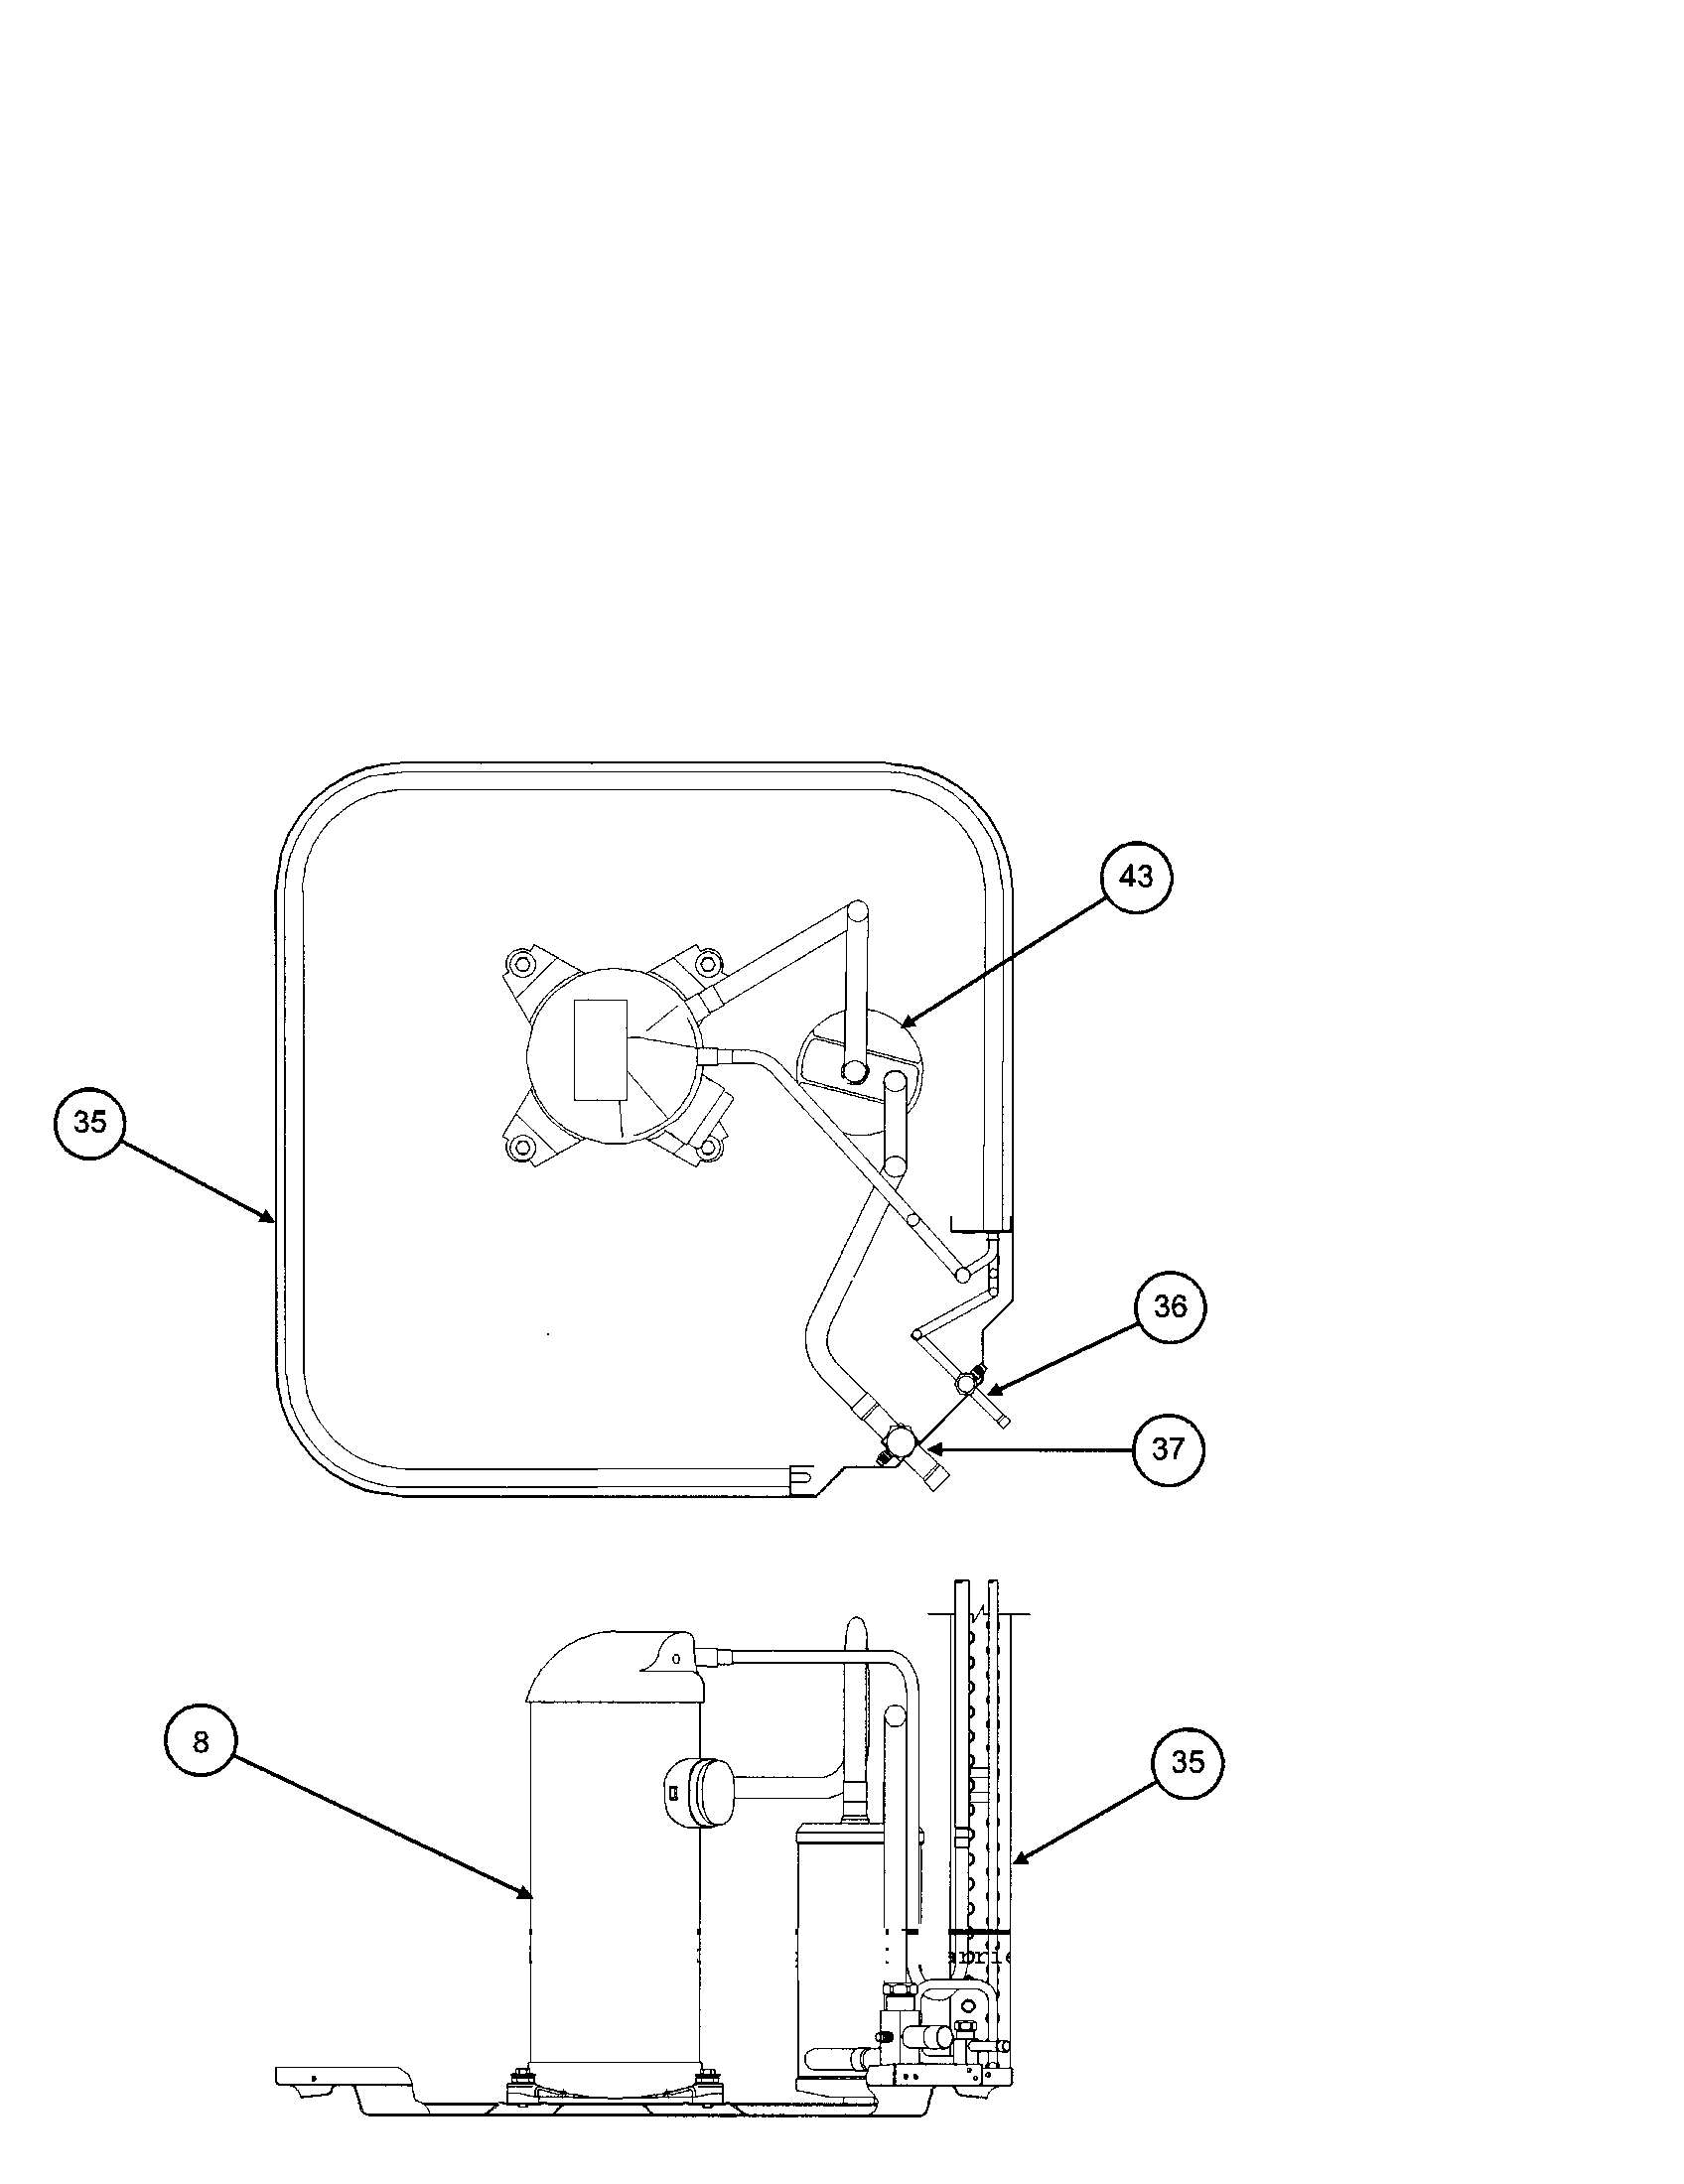 Carrier model 38CKC048 SERIES370 air-conditioner/heat pump